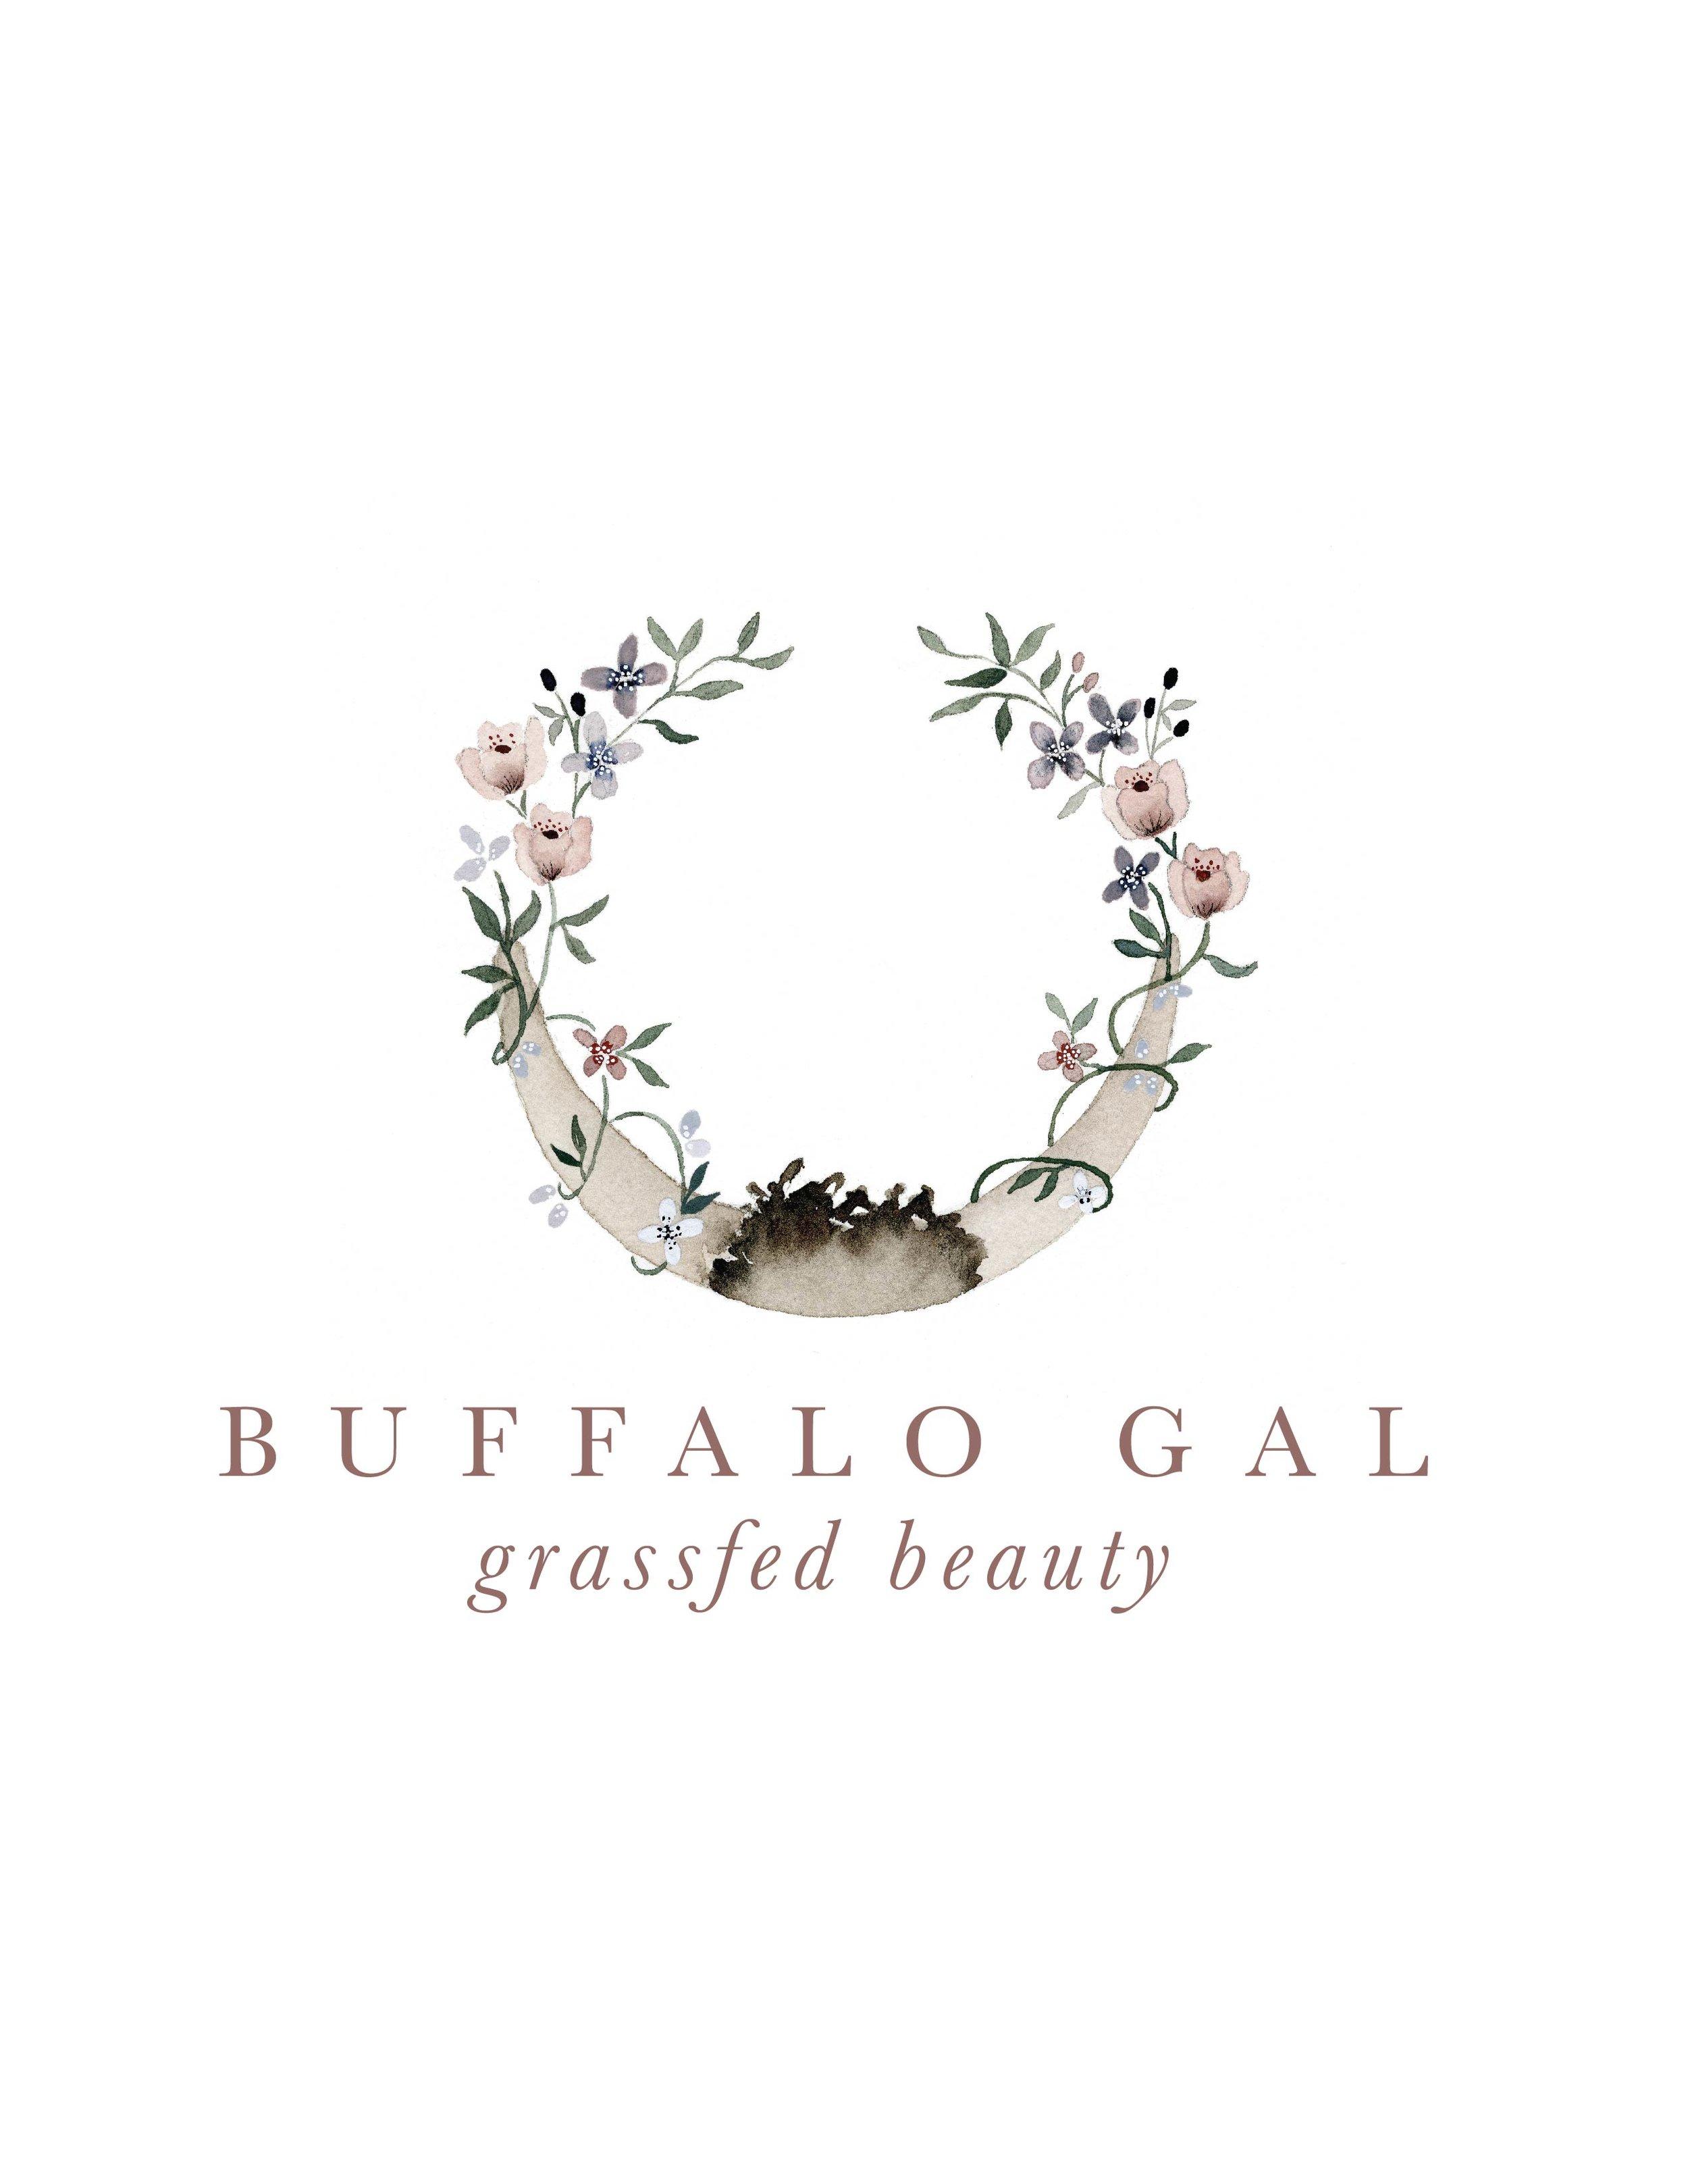 Buffalo Gal-02.jpg